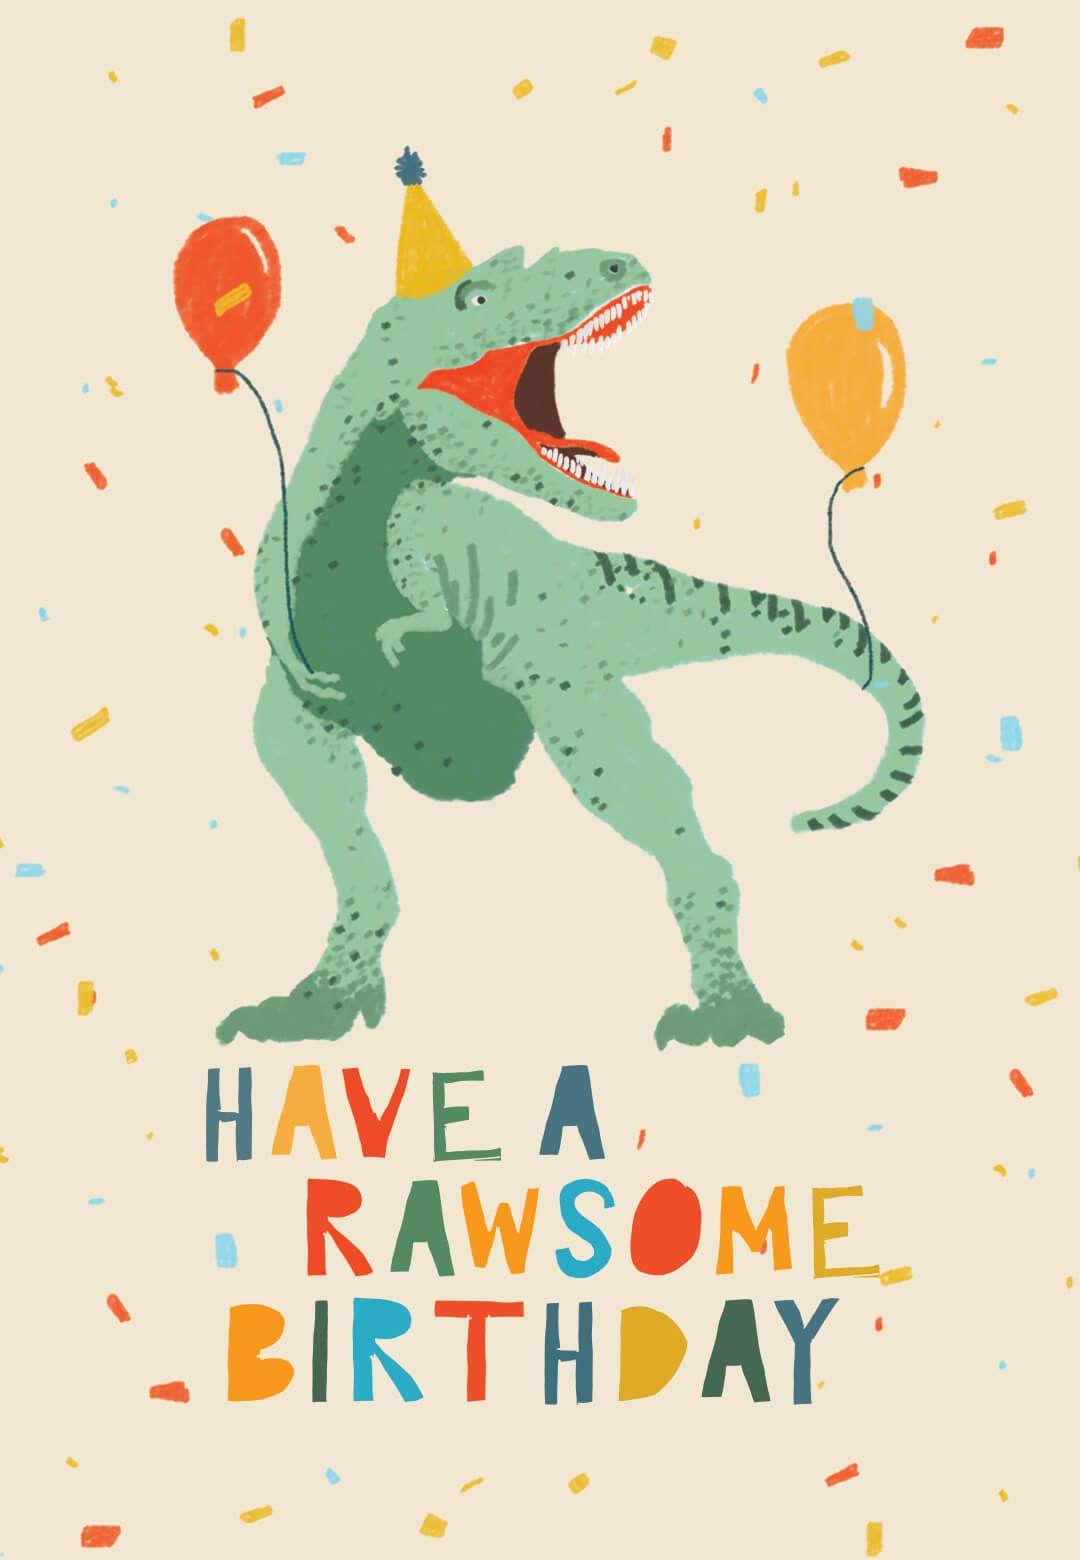 Dinosaur fiesta birthday card greetings island happy